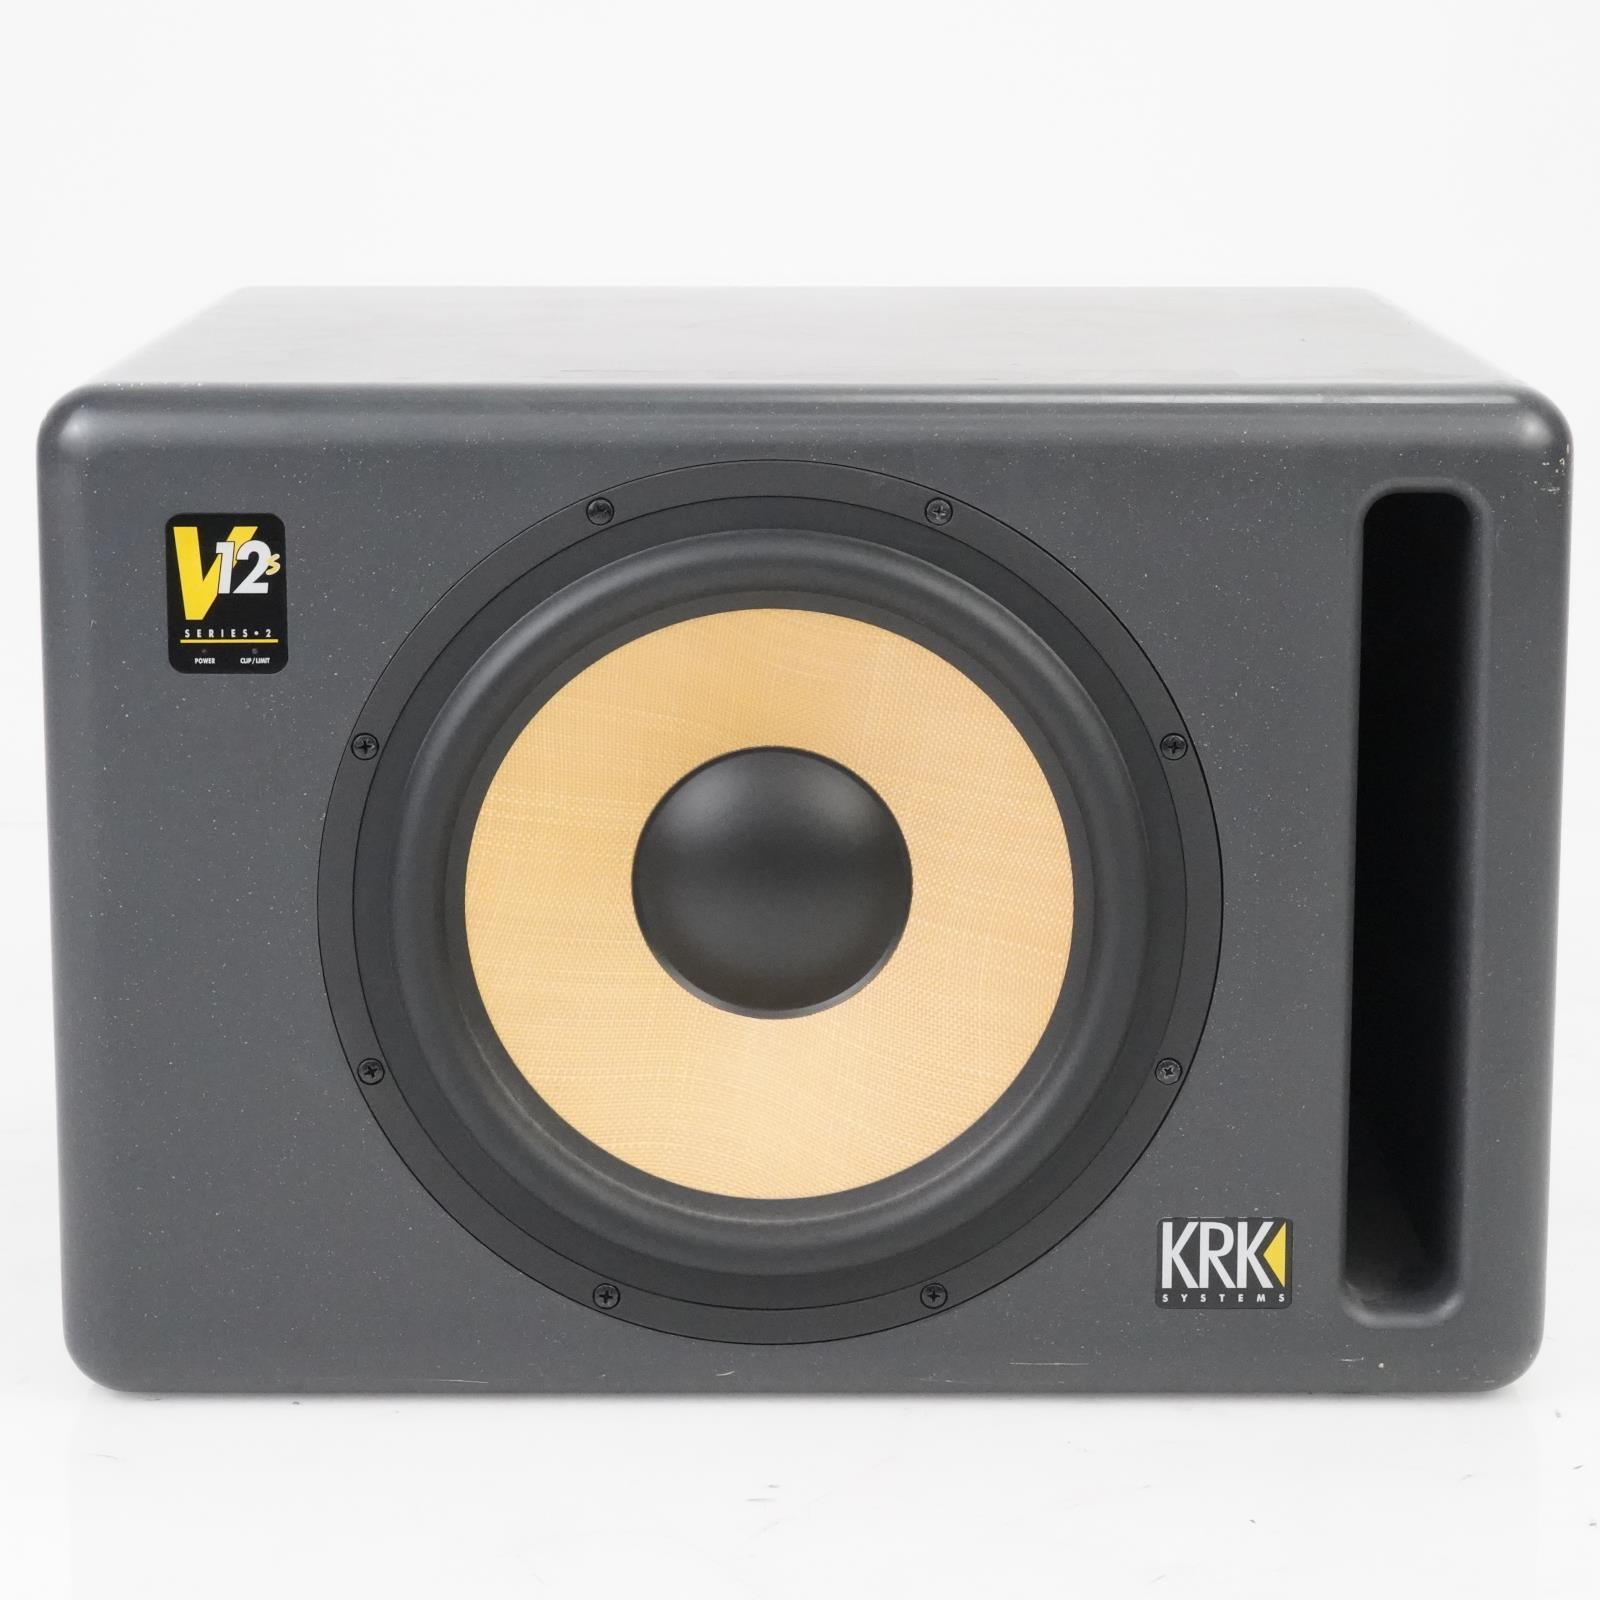 KRK V12s Series 2 Active Powered Subwoofer Speaker Ed Cherney #39094